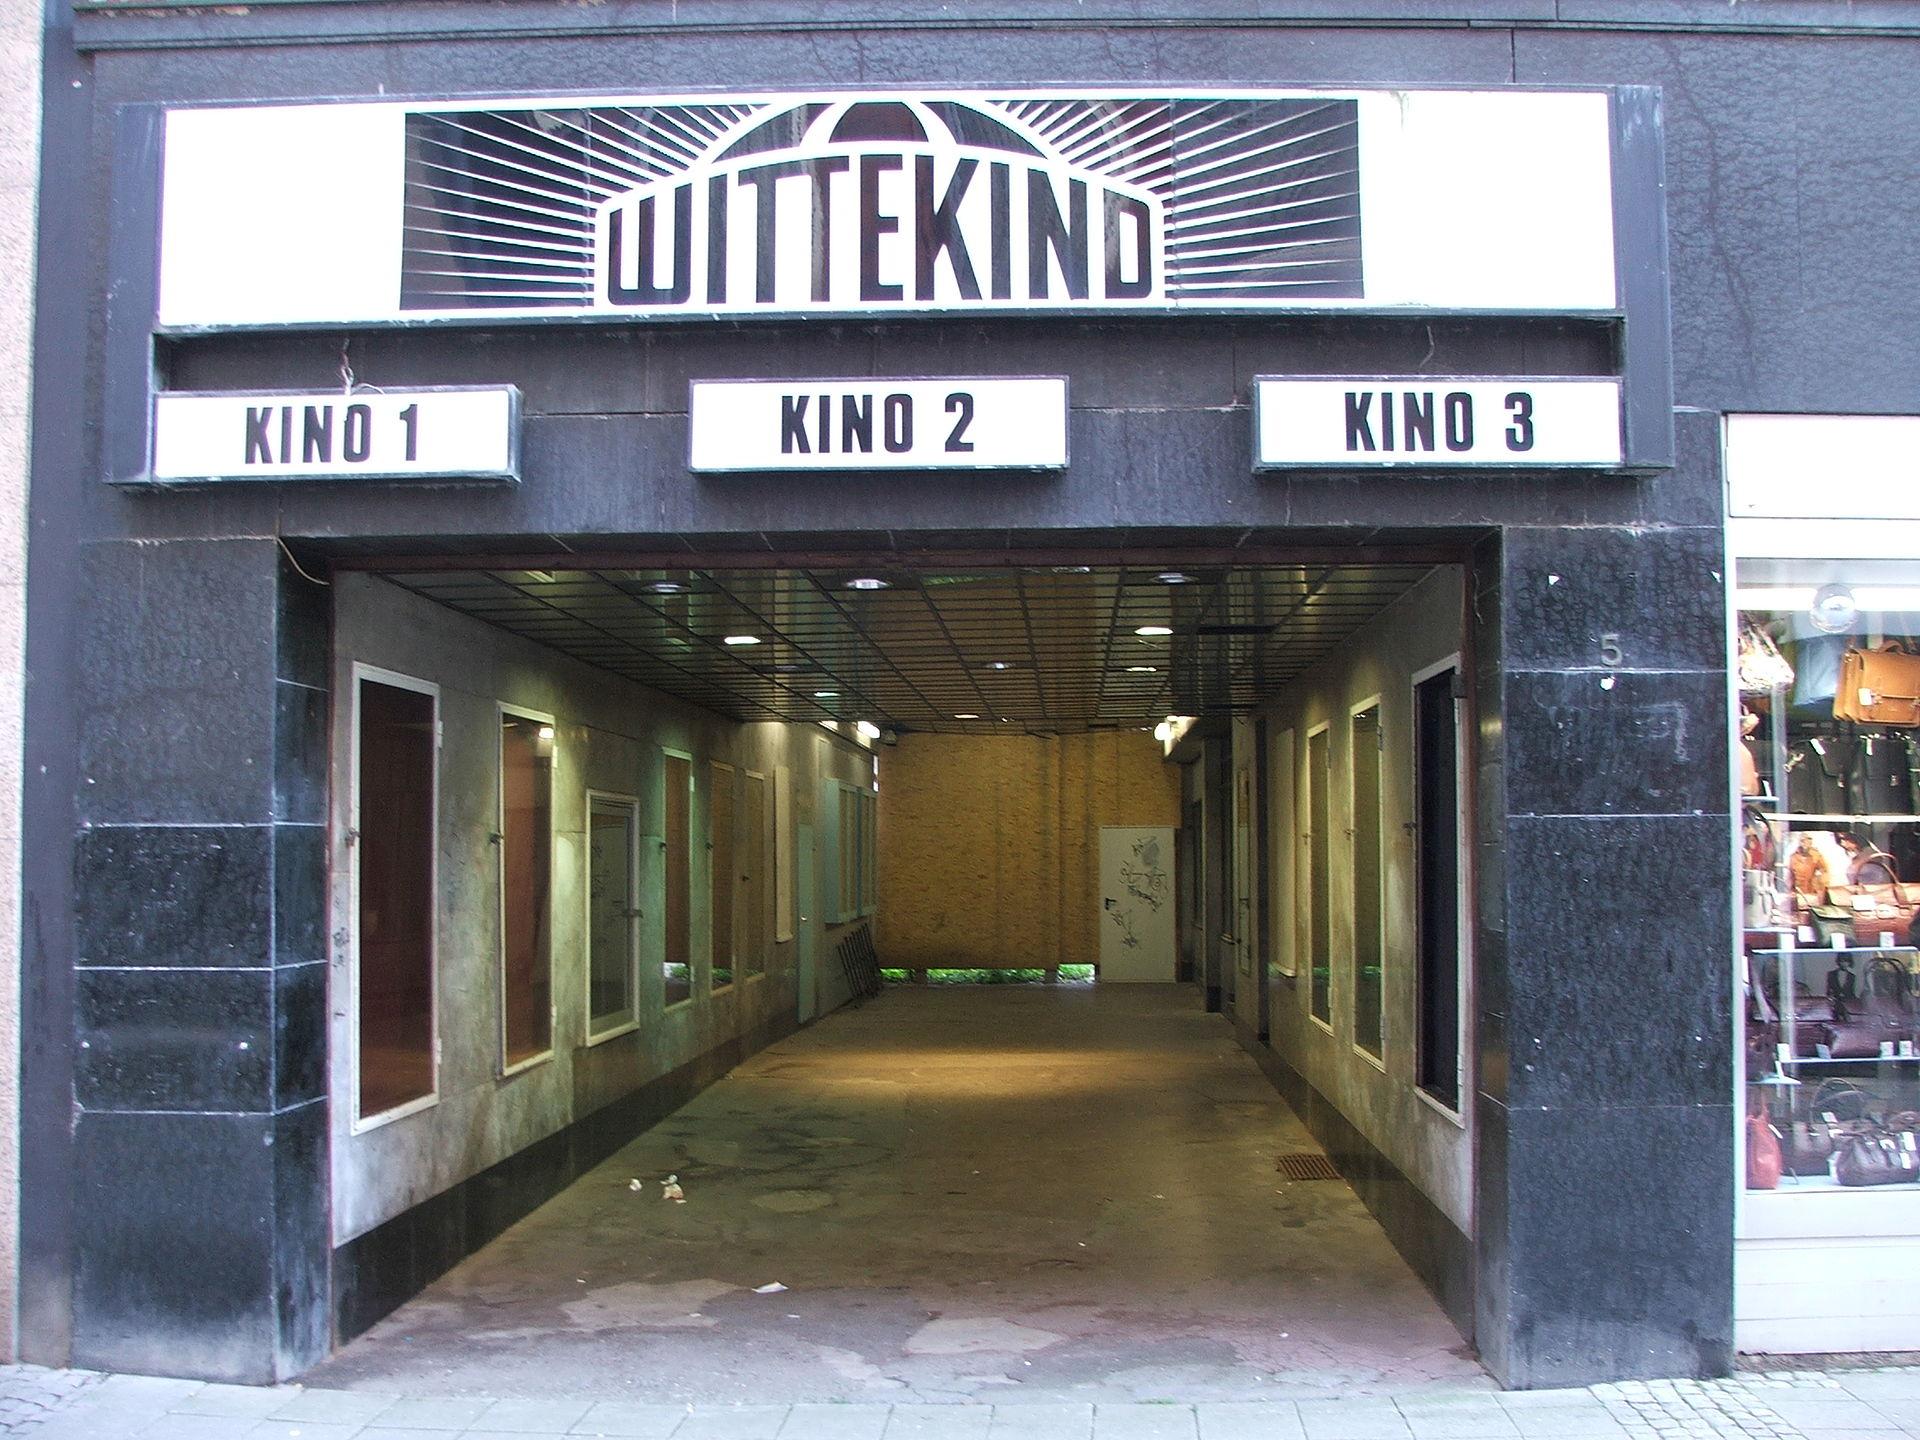 Kino Herford